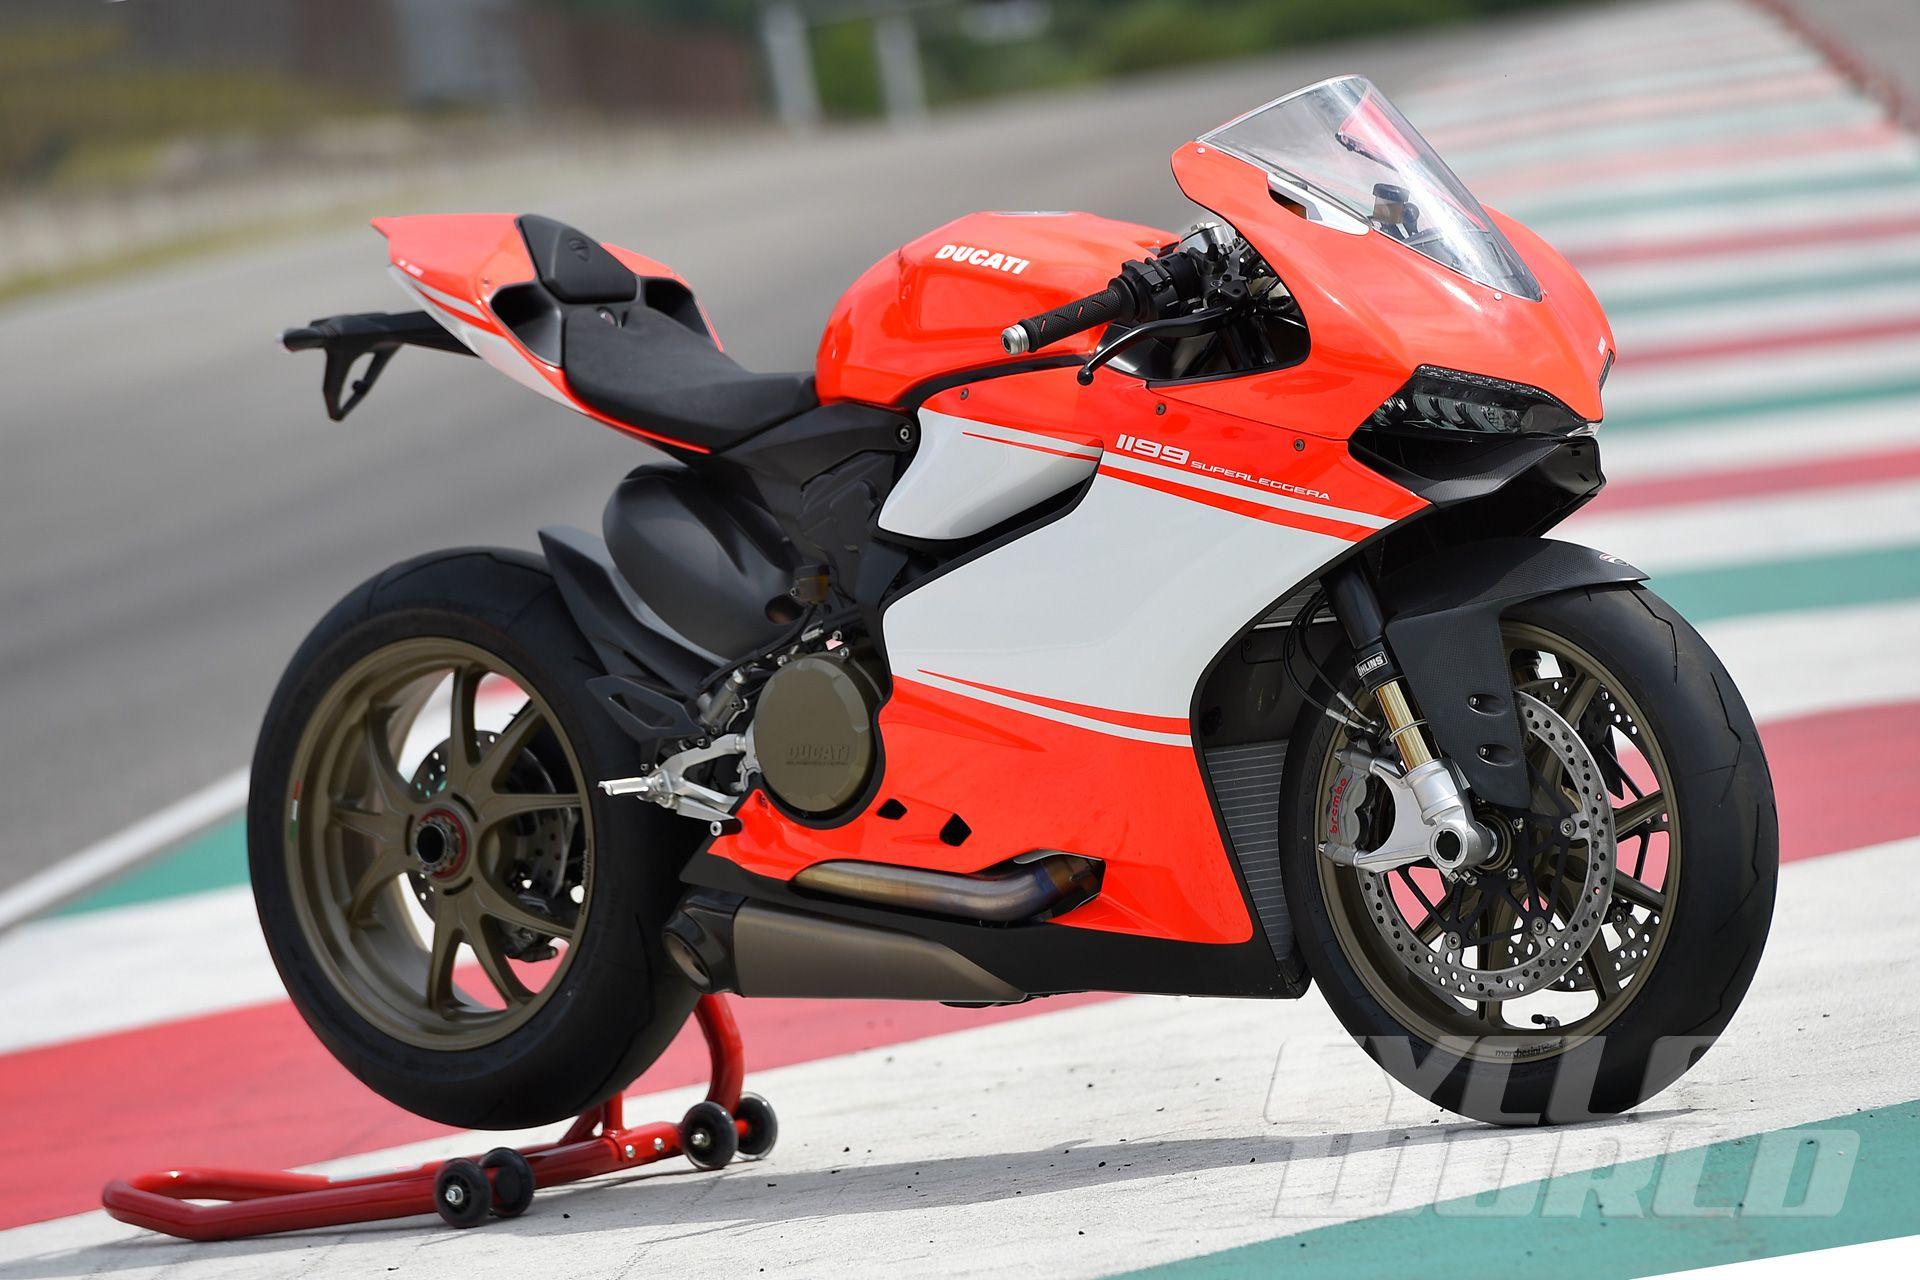 15 2014 Ducati 1199 Superleggera Kate Gone N 60 My List Hypermotard 796 Engine Diagram Valve